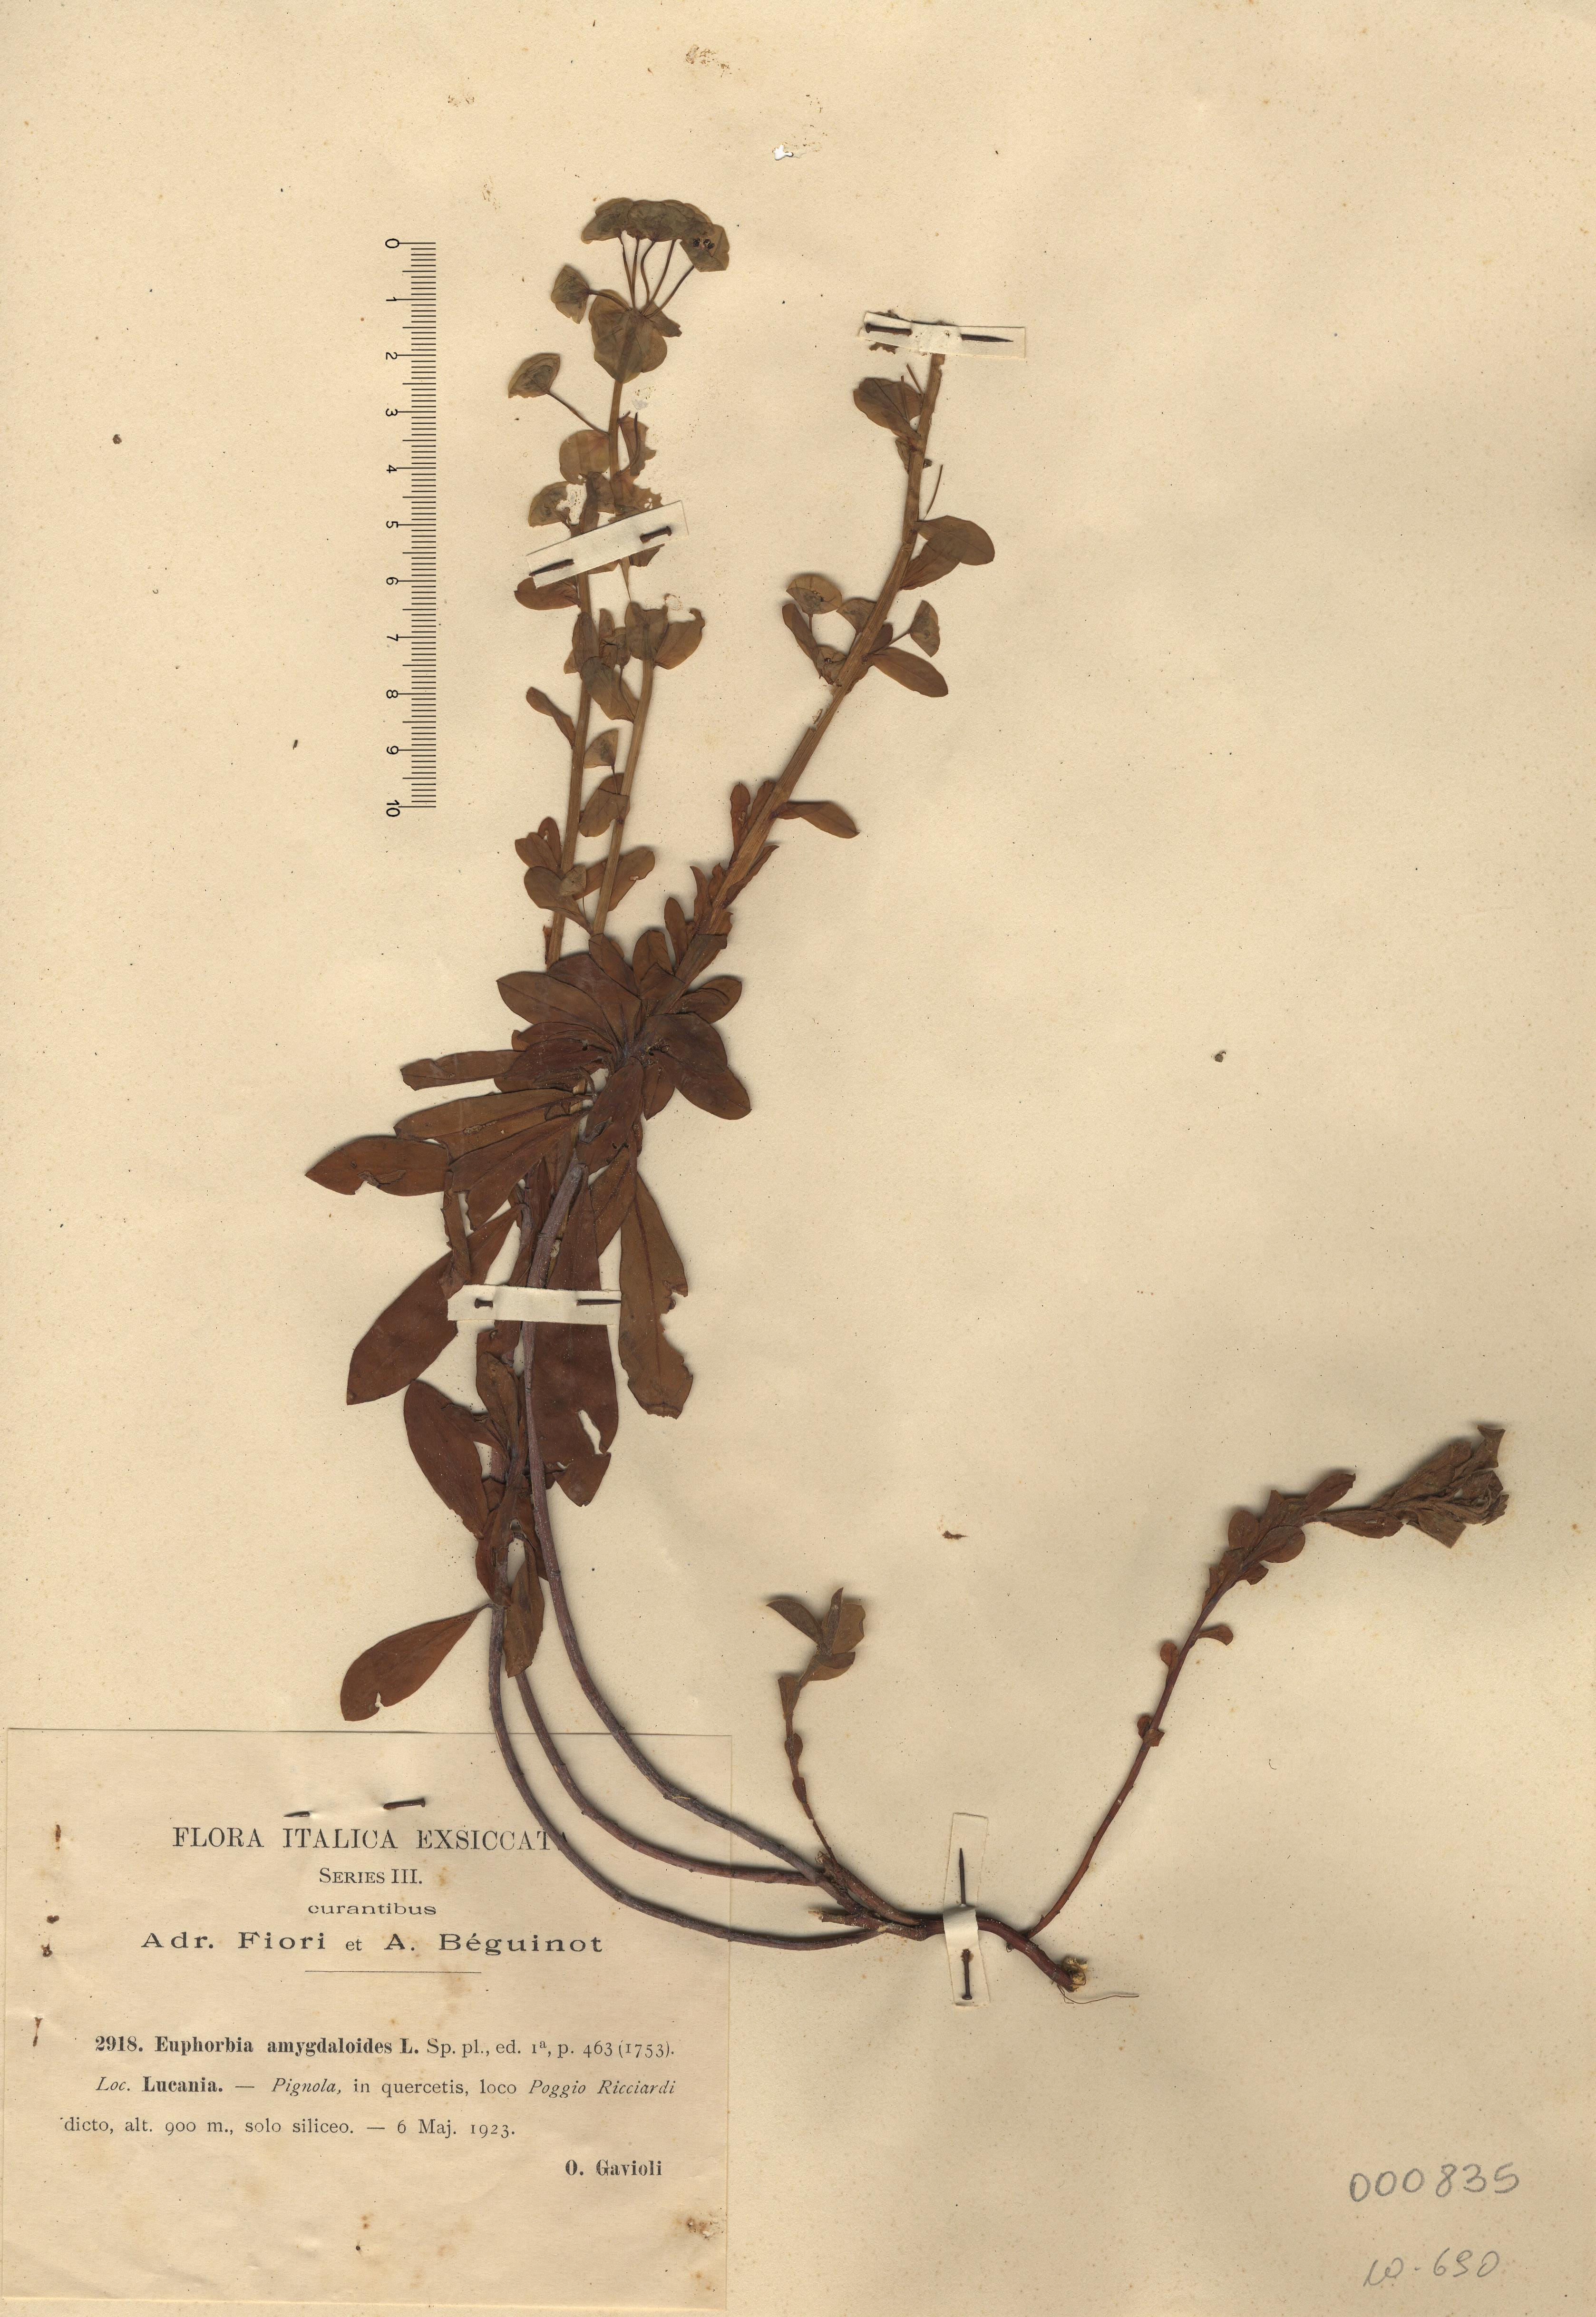 © Hortus Botanicus Catinens - Herb. shhet 000835<br>